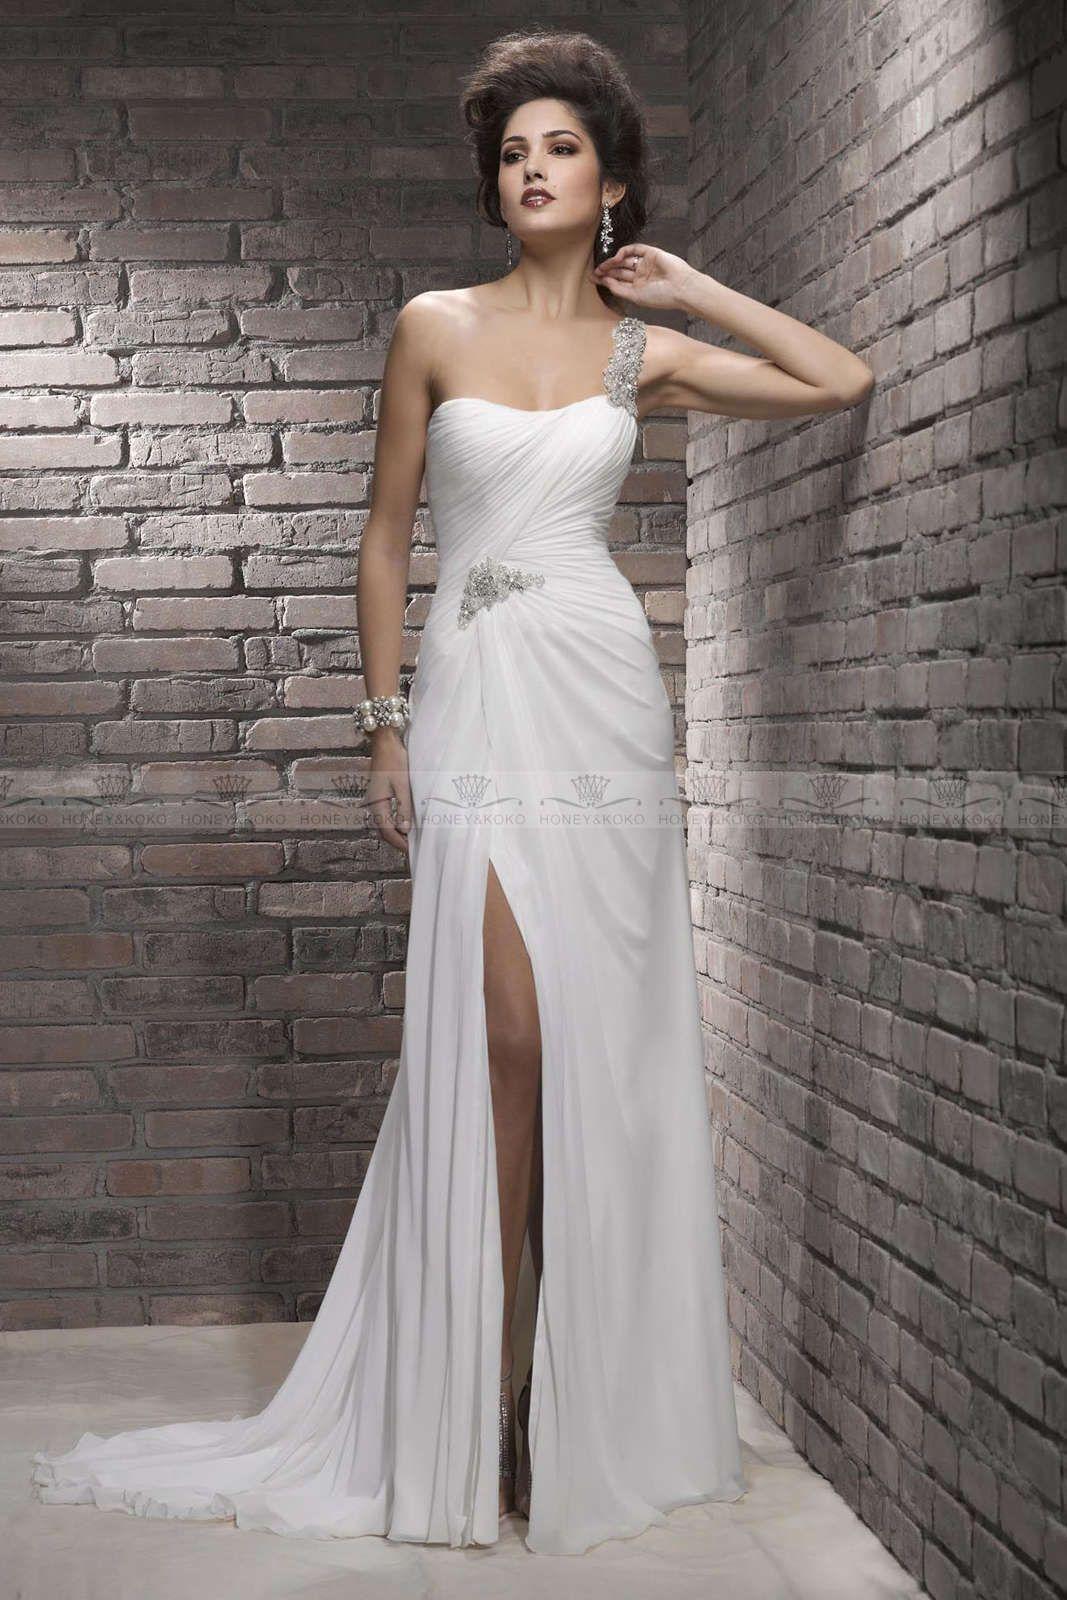 Lace beach wedding dresses photos hd wedding concepts pinterest